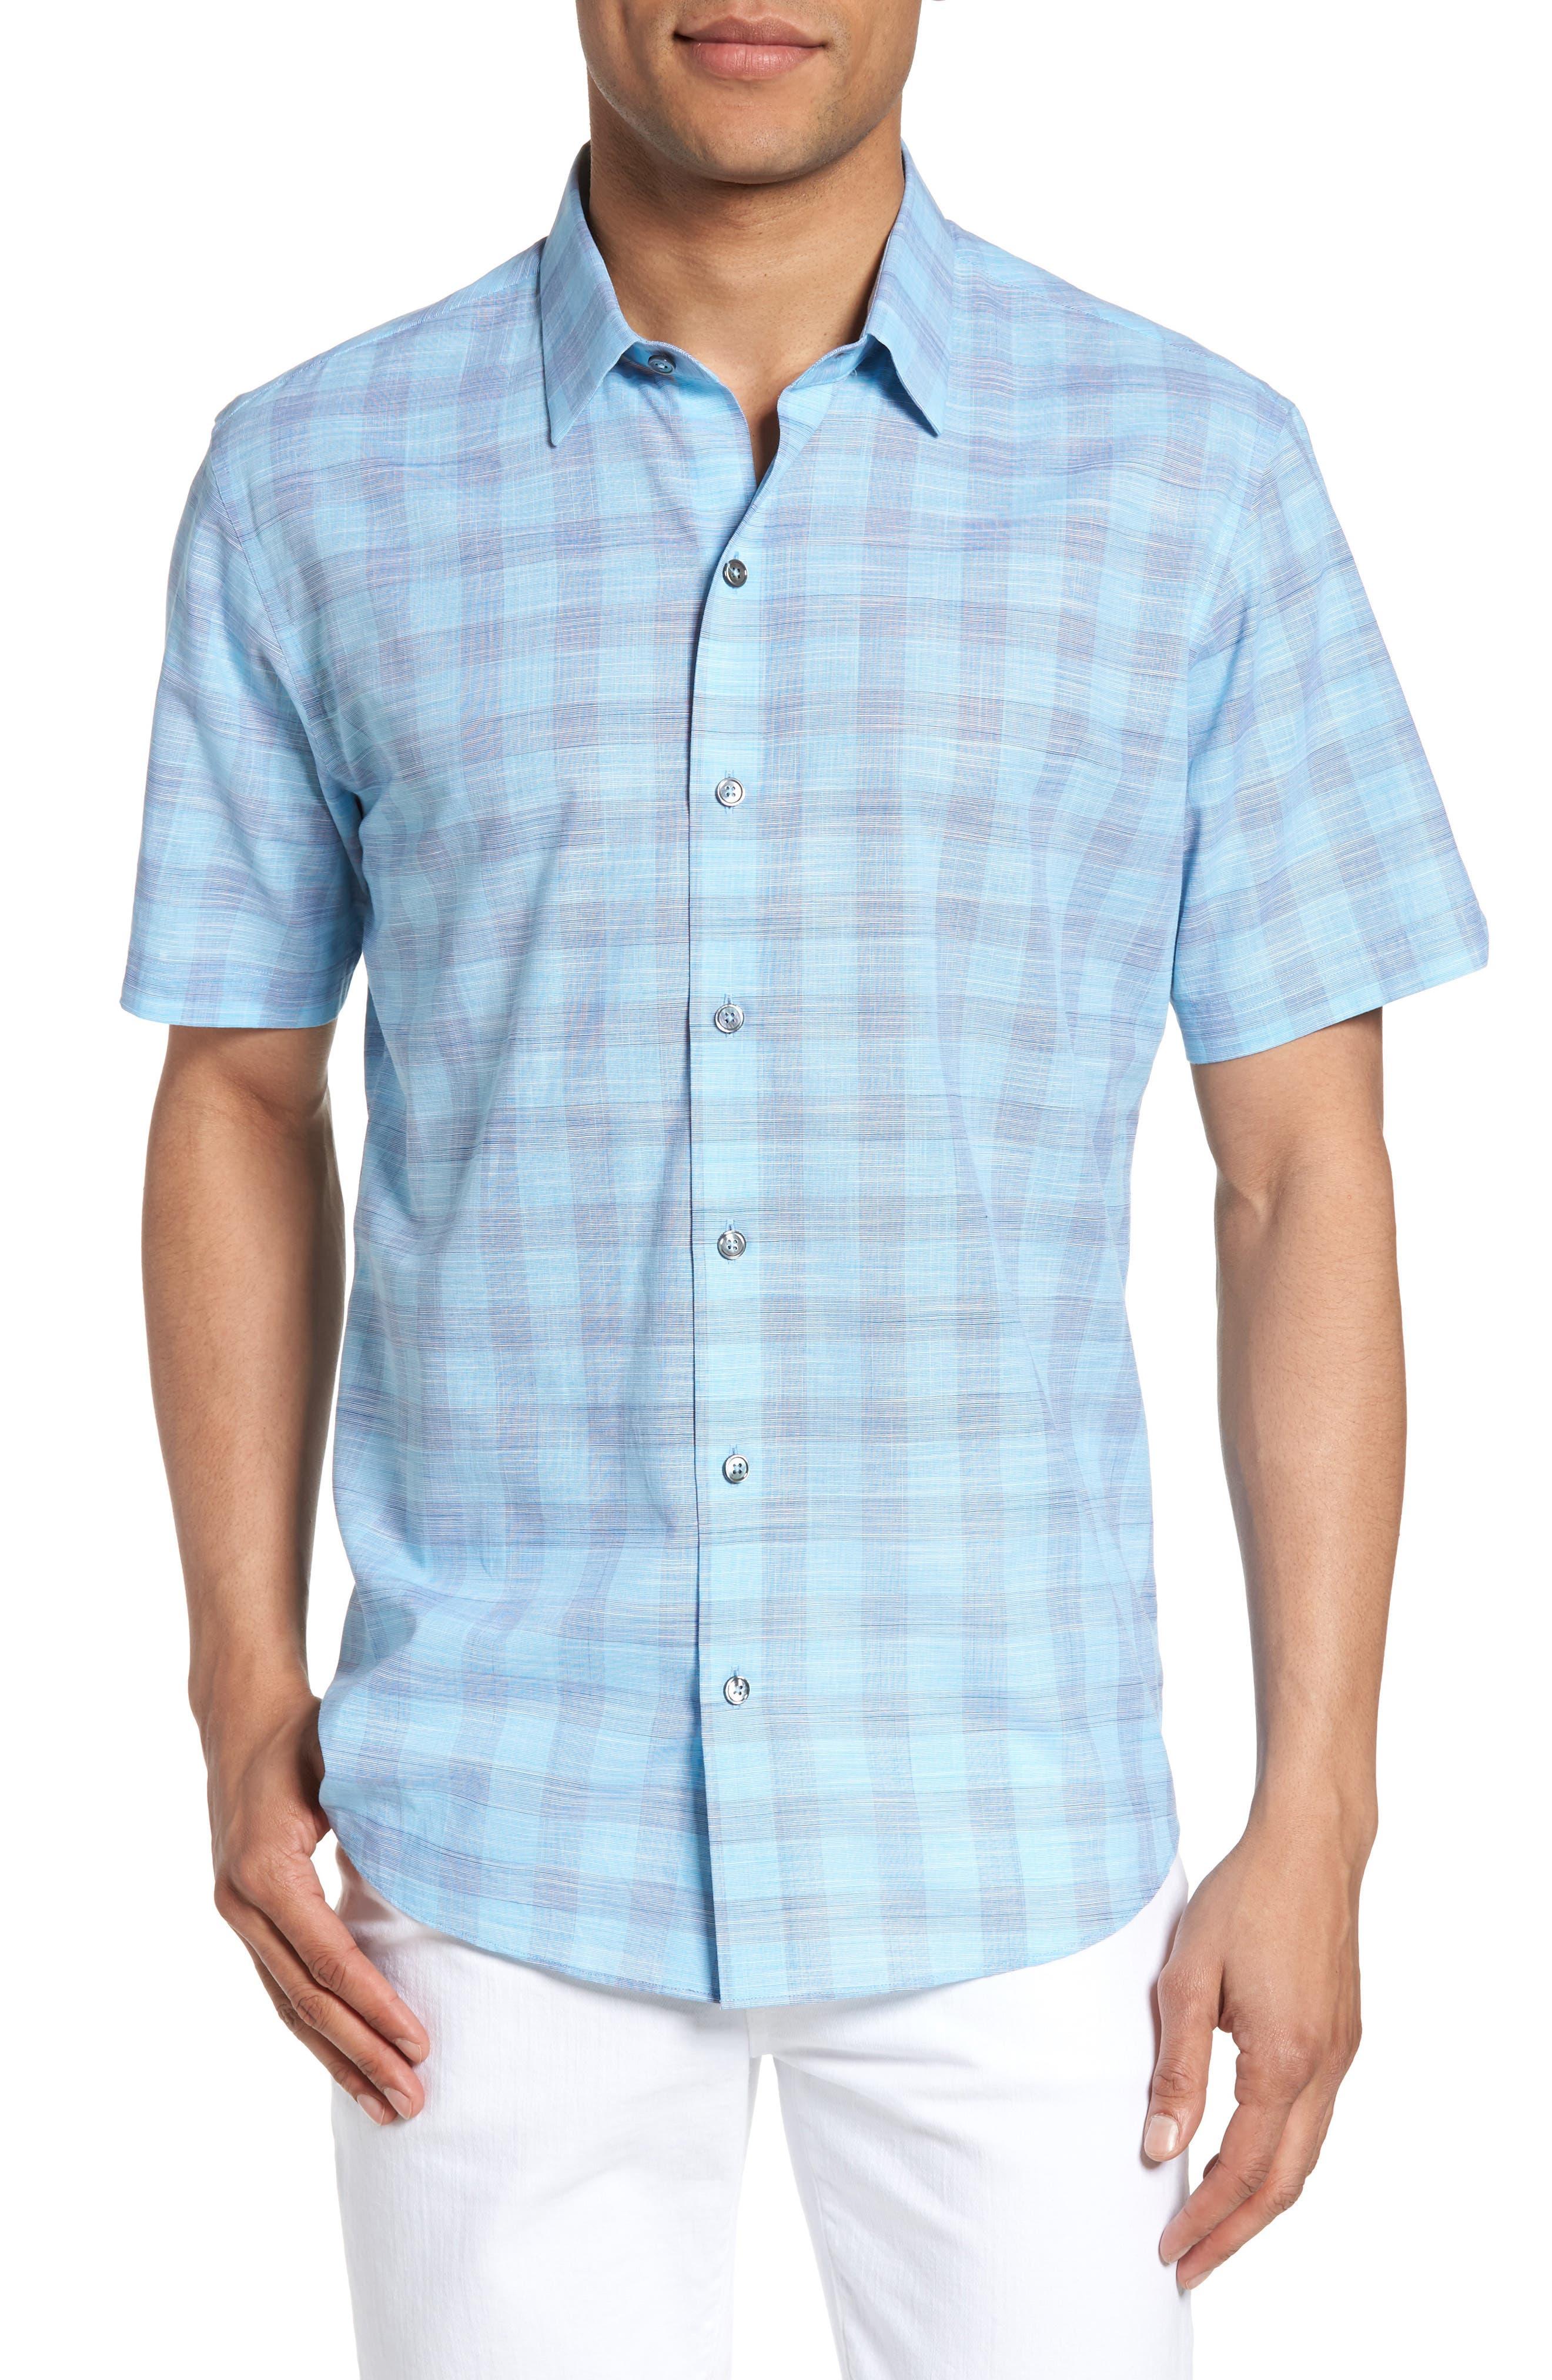 Hasanagic Trim Fit Plaid Sport Shirt,                         Main,                         color, 439